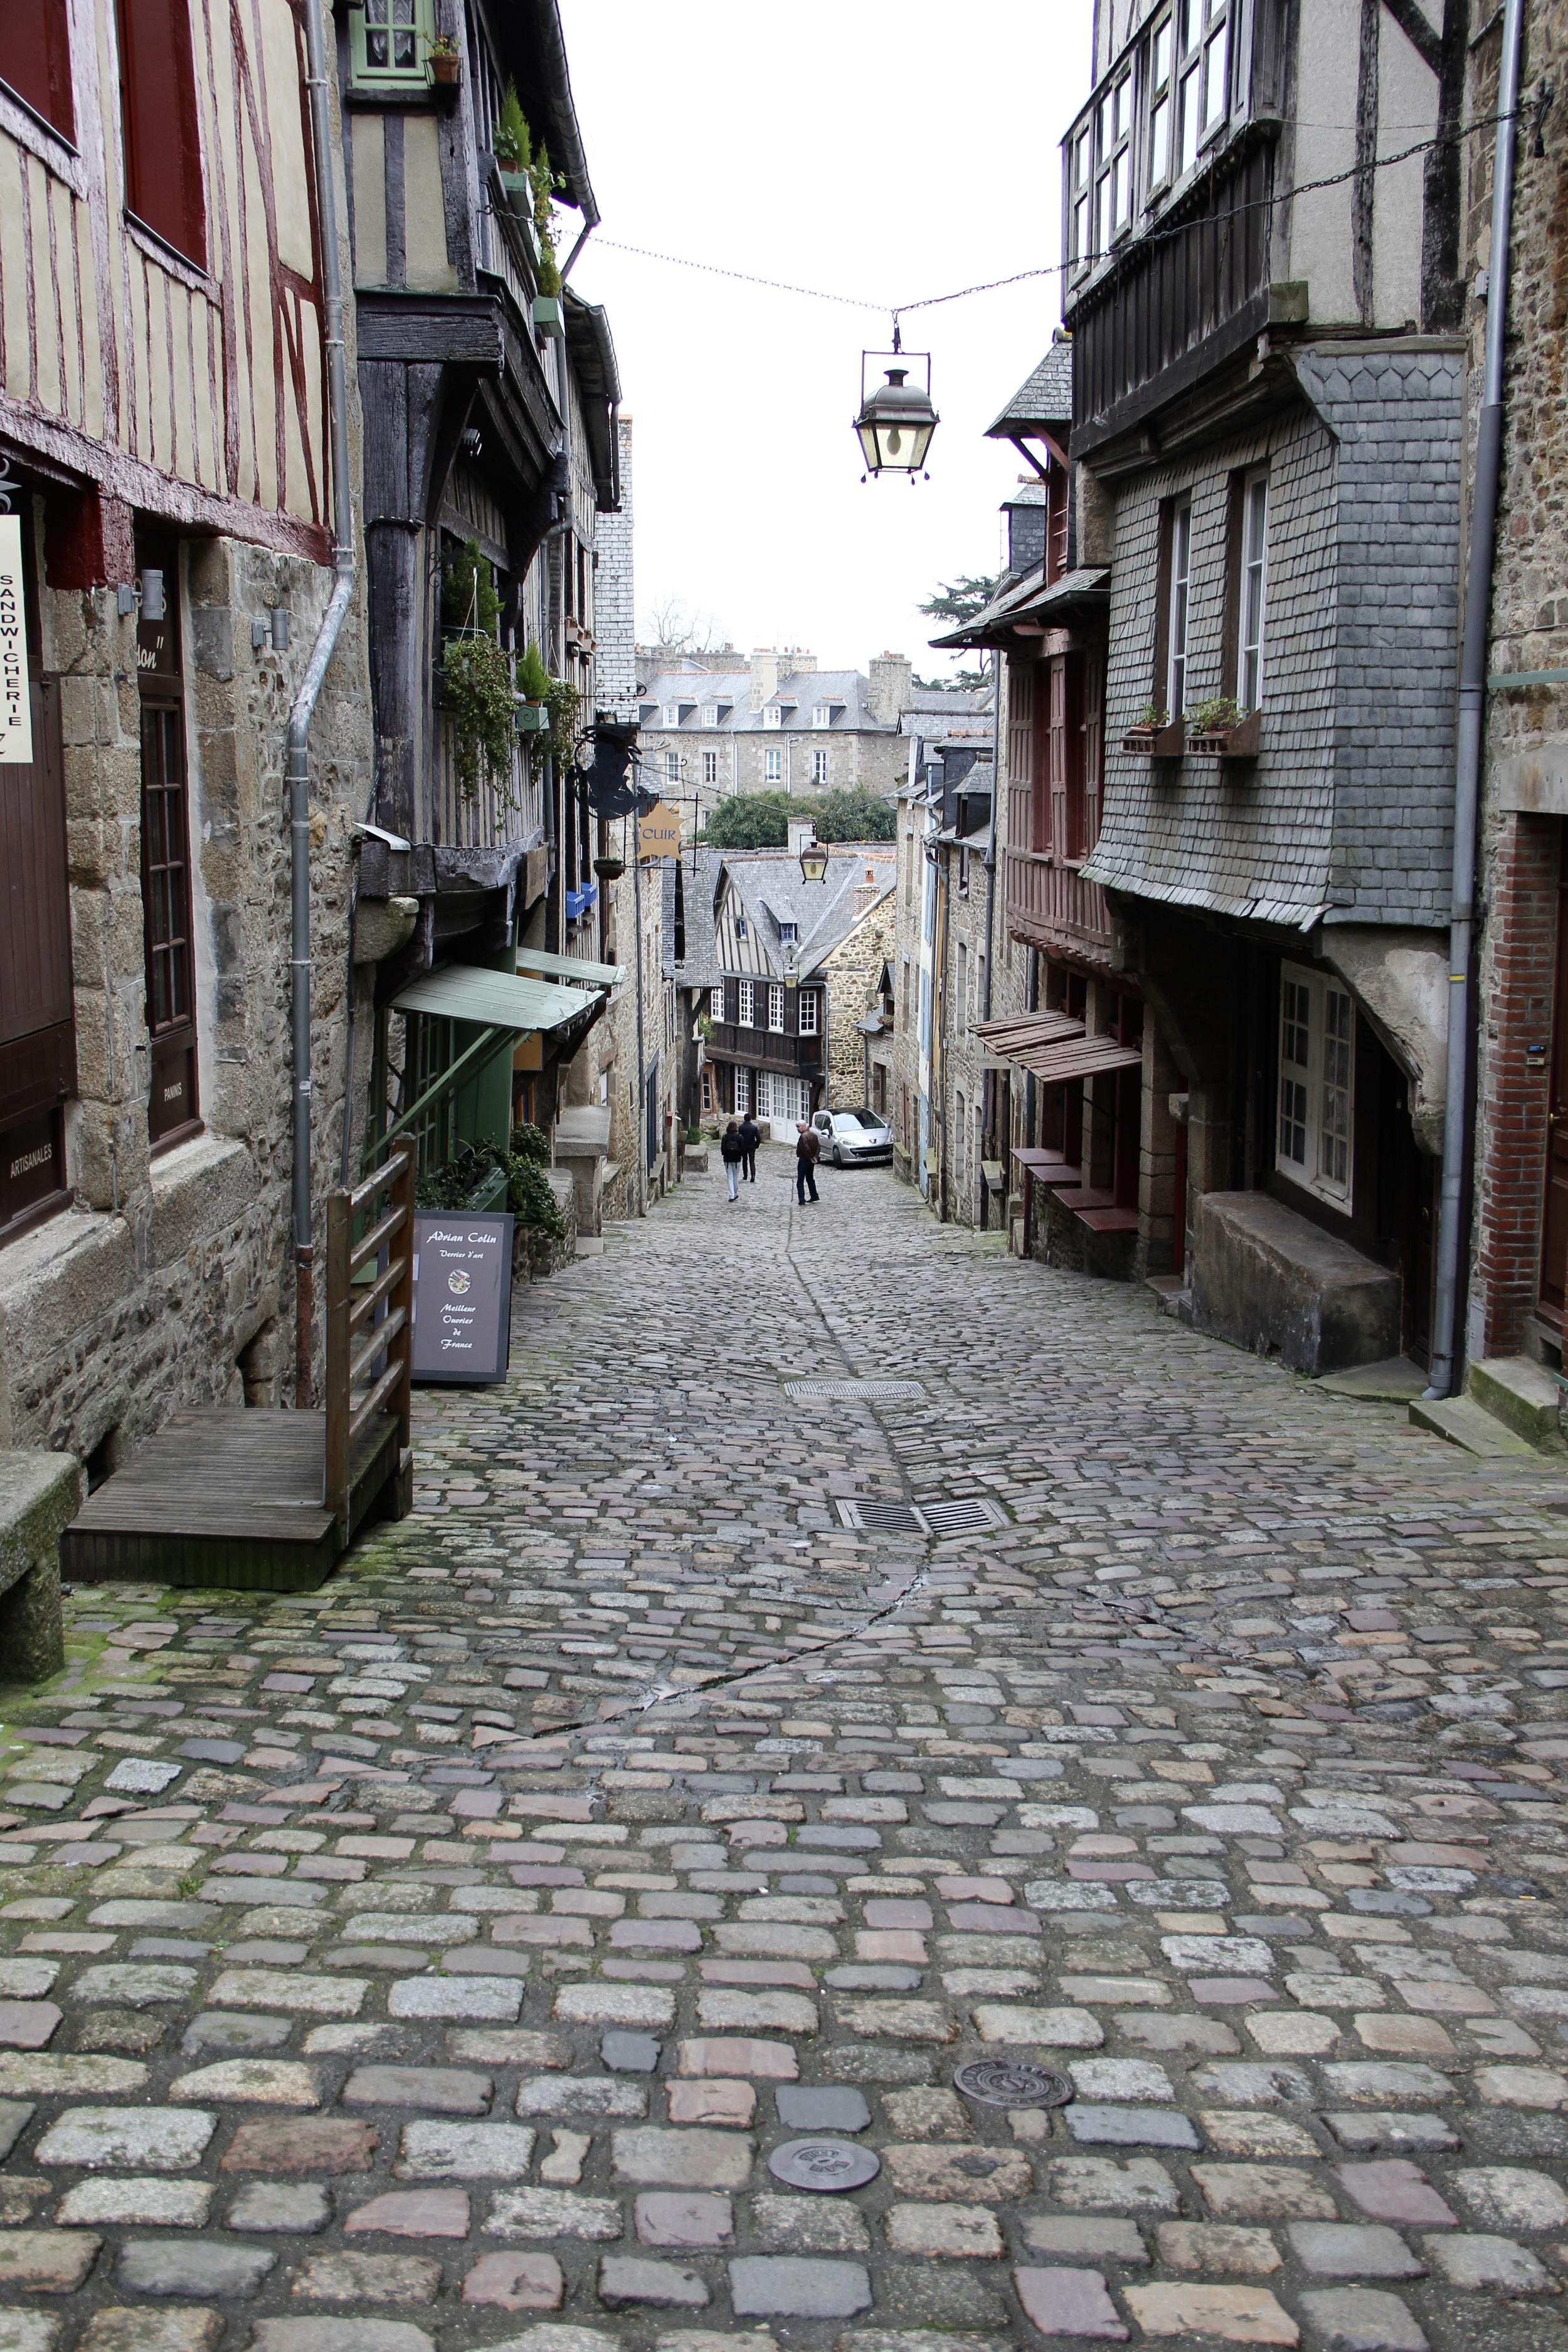 Rue du Petit-Fort, Dinan, France